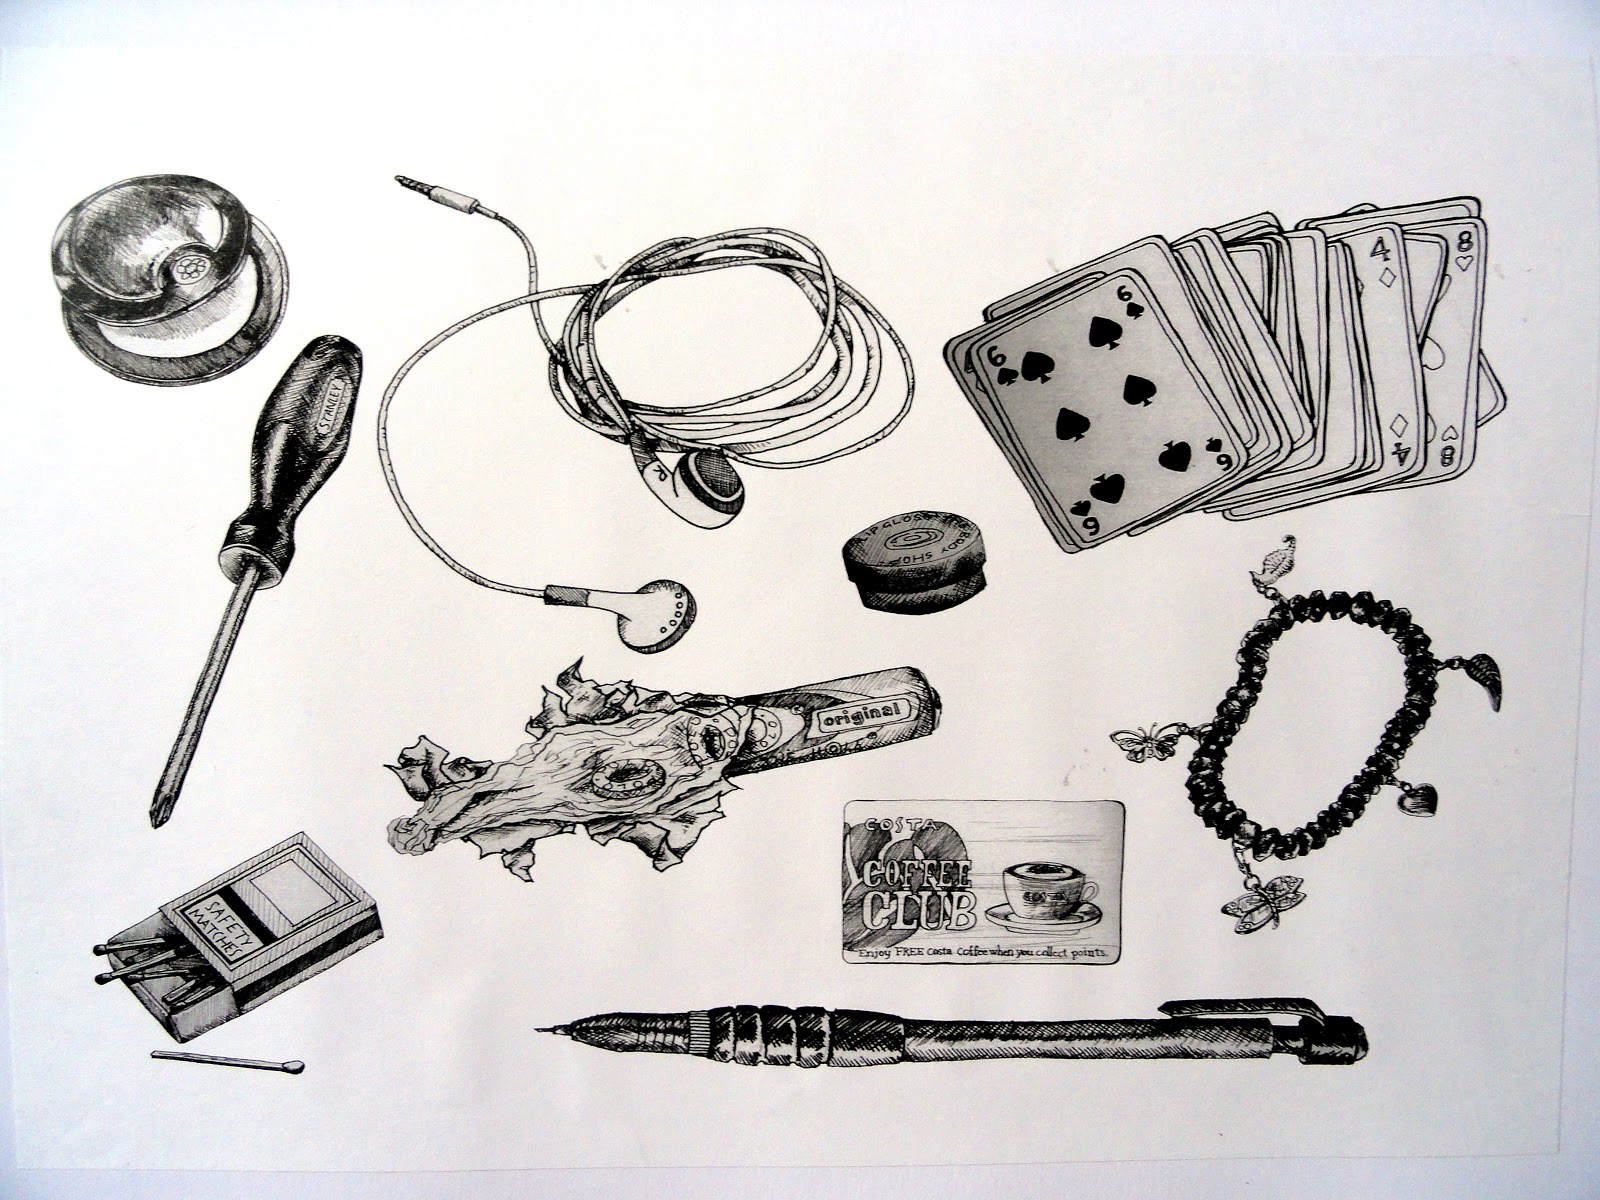 art and illustration screen printing design ideas